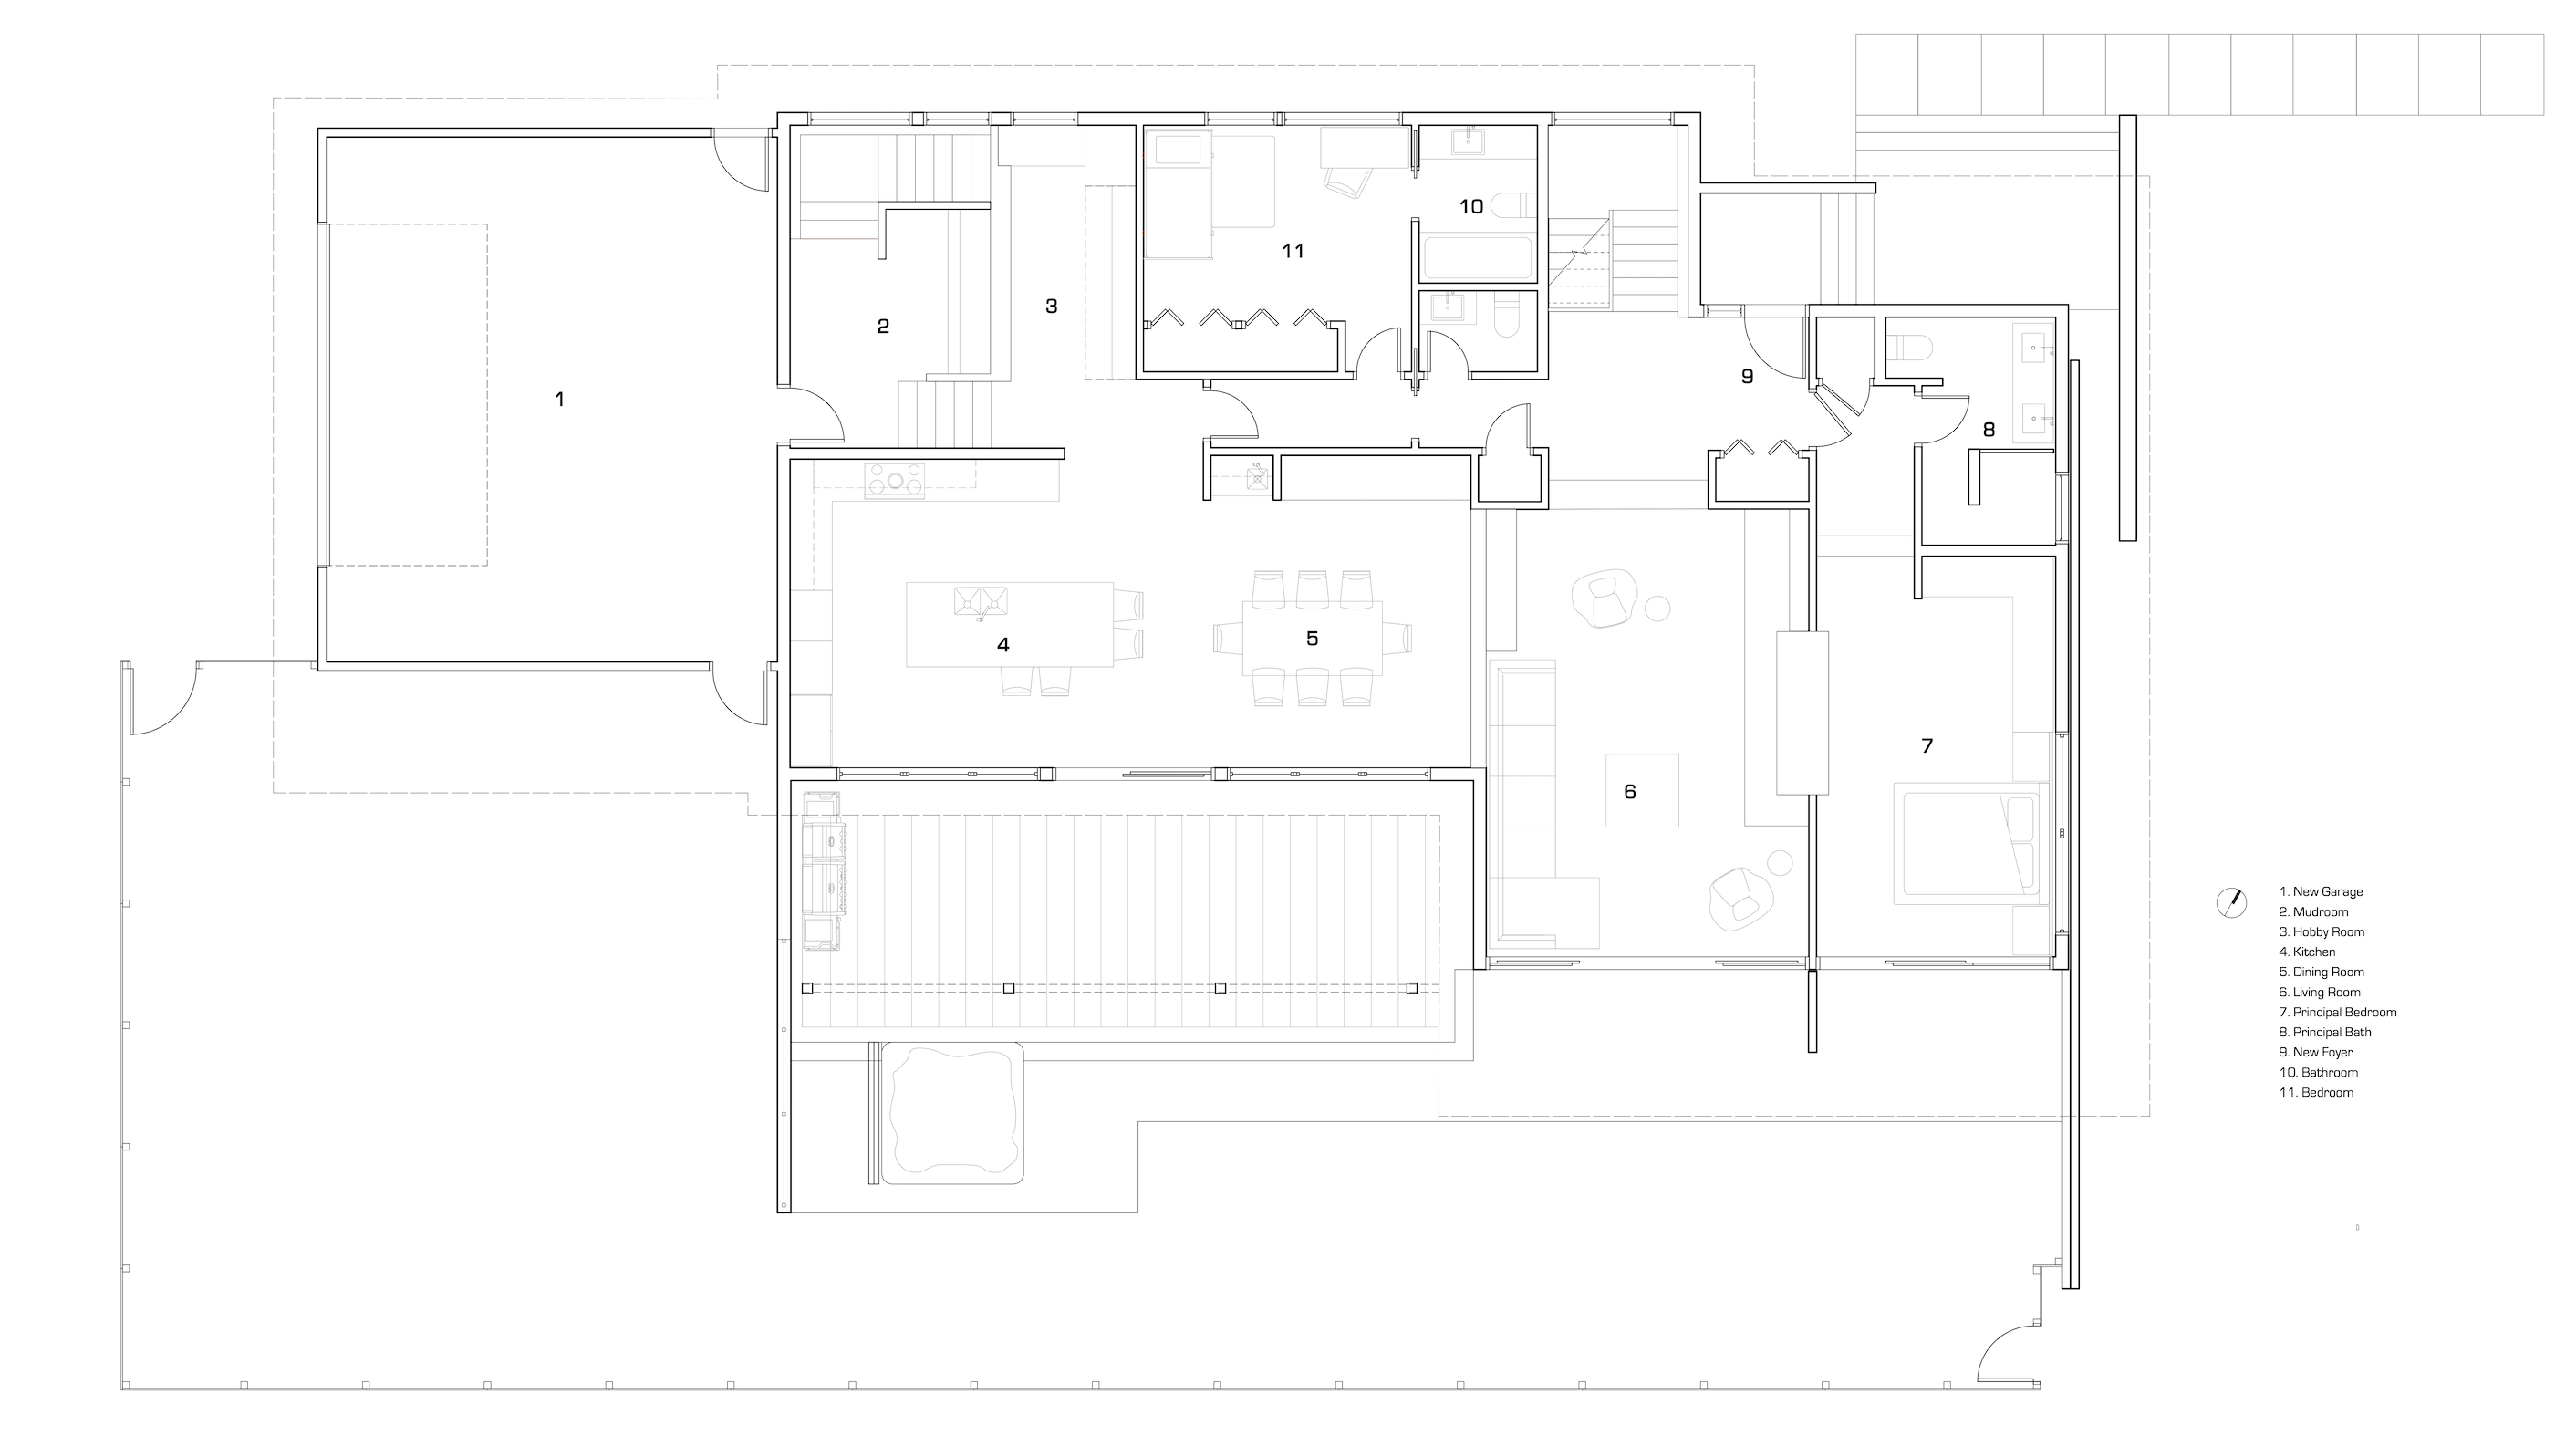 Unit 7 Architecture | Residential - Oak Street Mid Century